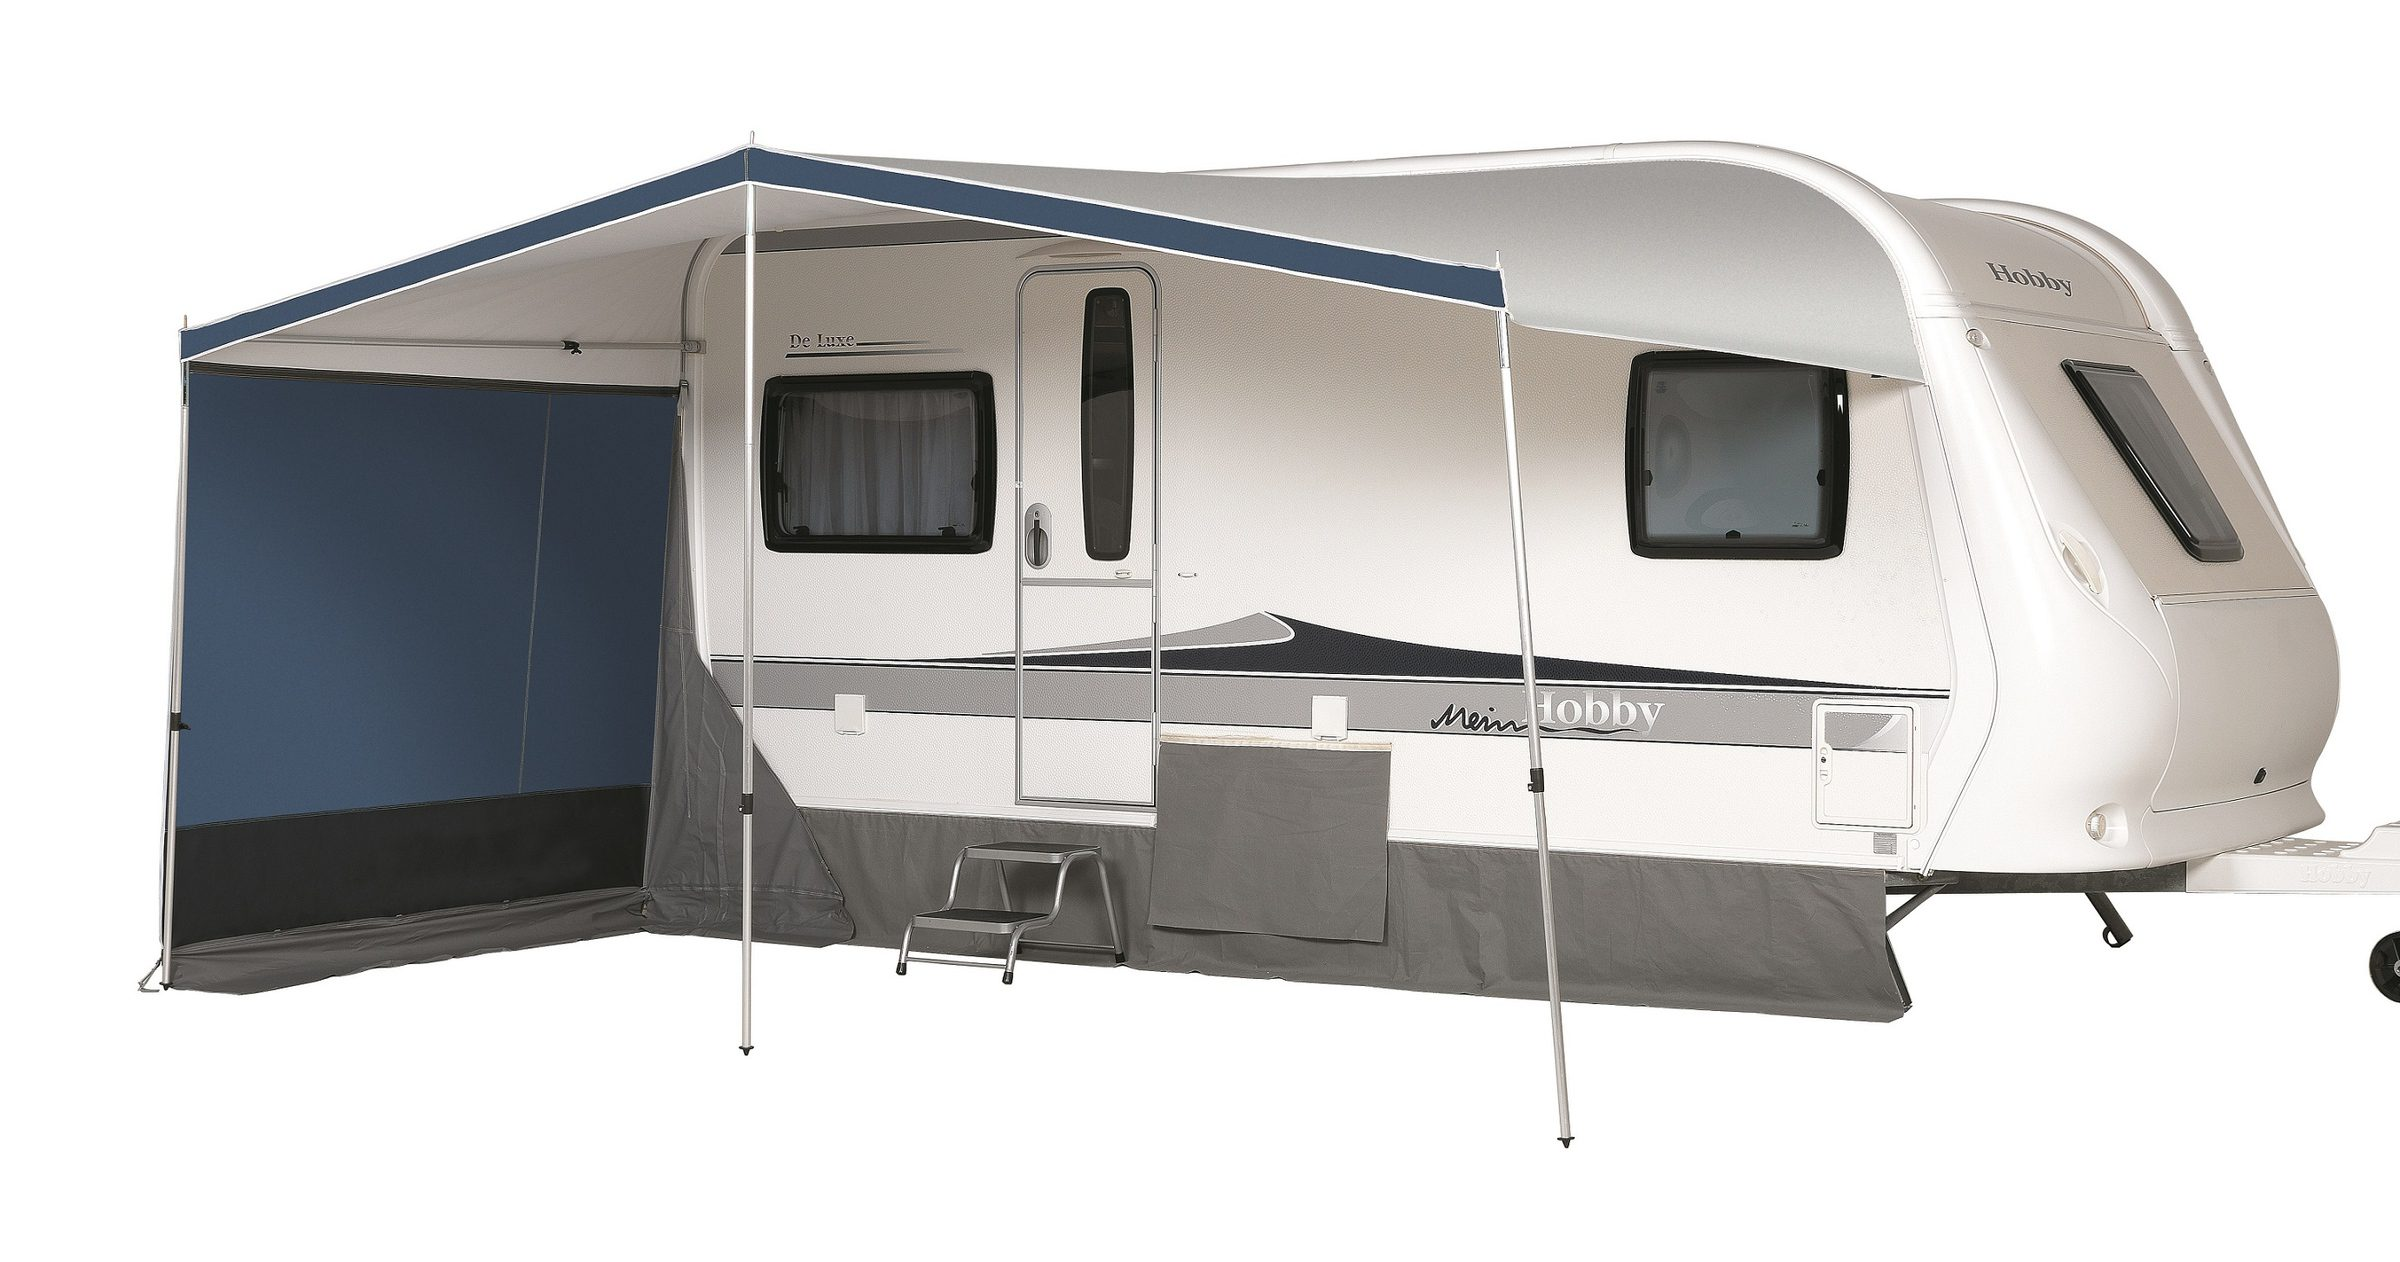 dorema caravan canopy vario 2018 sun canopies norwich. Black Bedroom Furniture Sets. Home Design Ideas